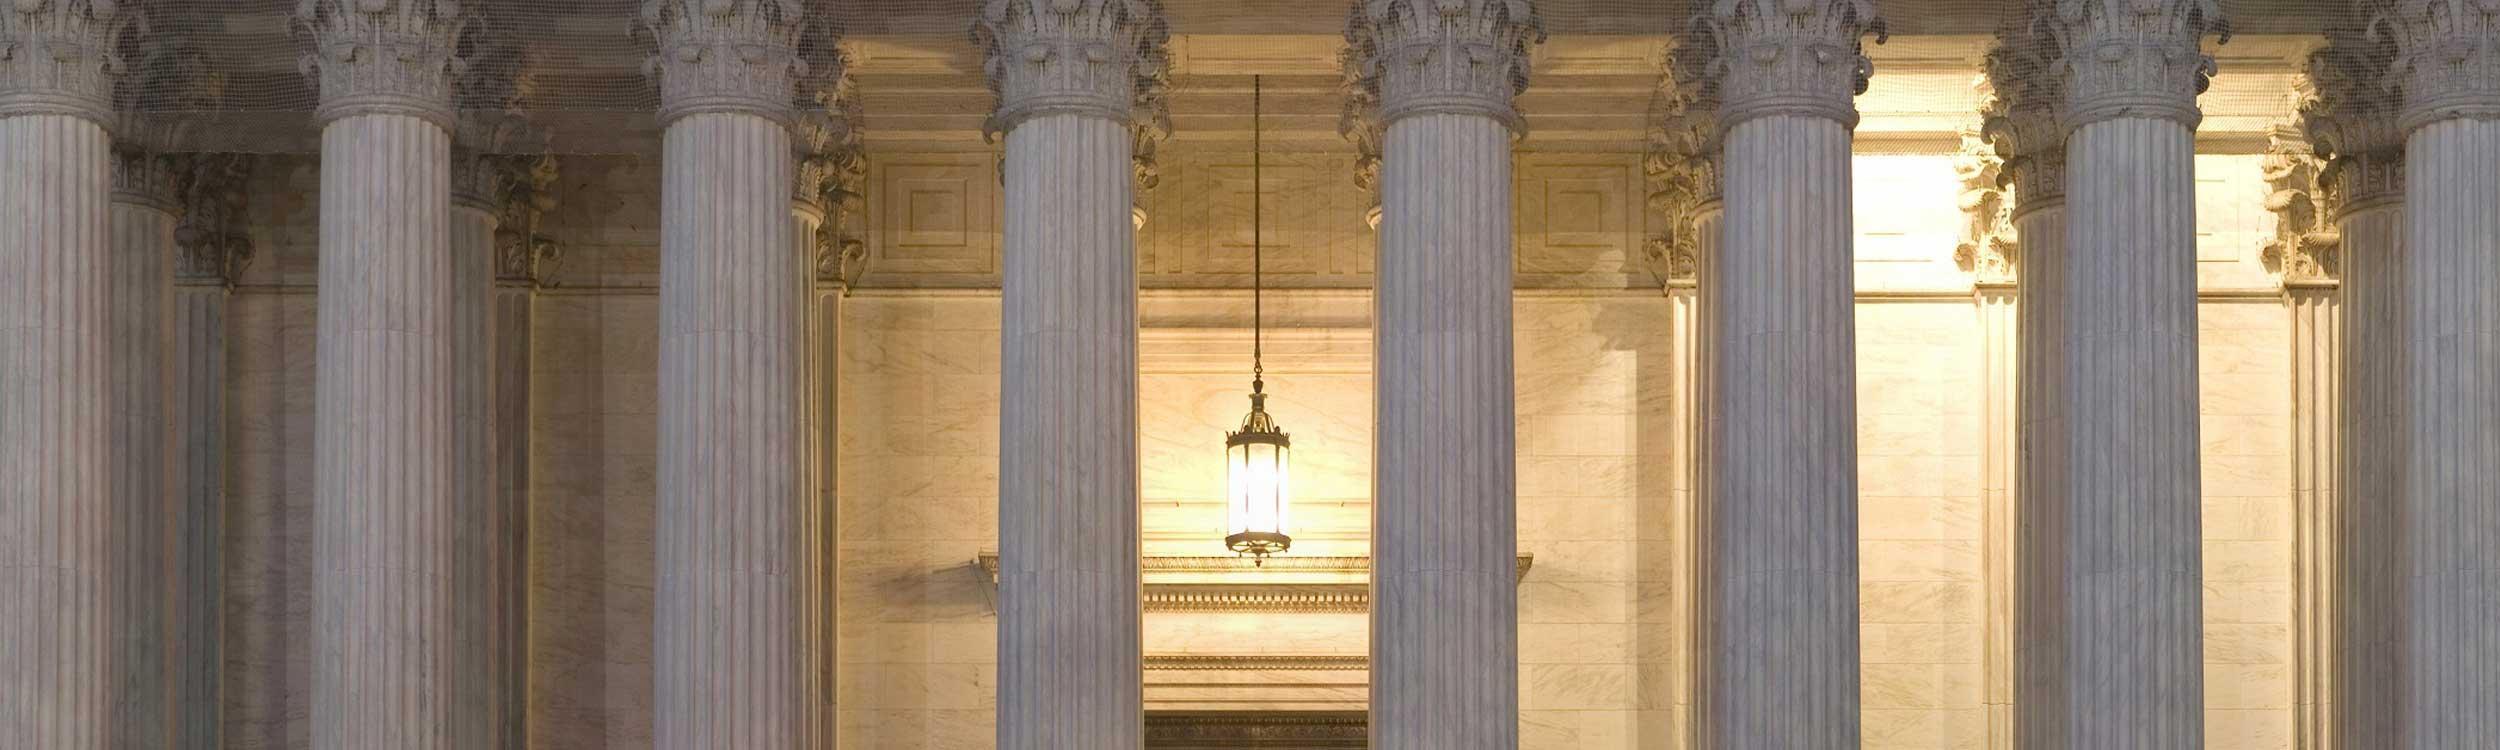 Lisa Orlow Esq slider court building 1 1